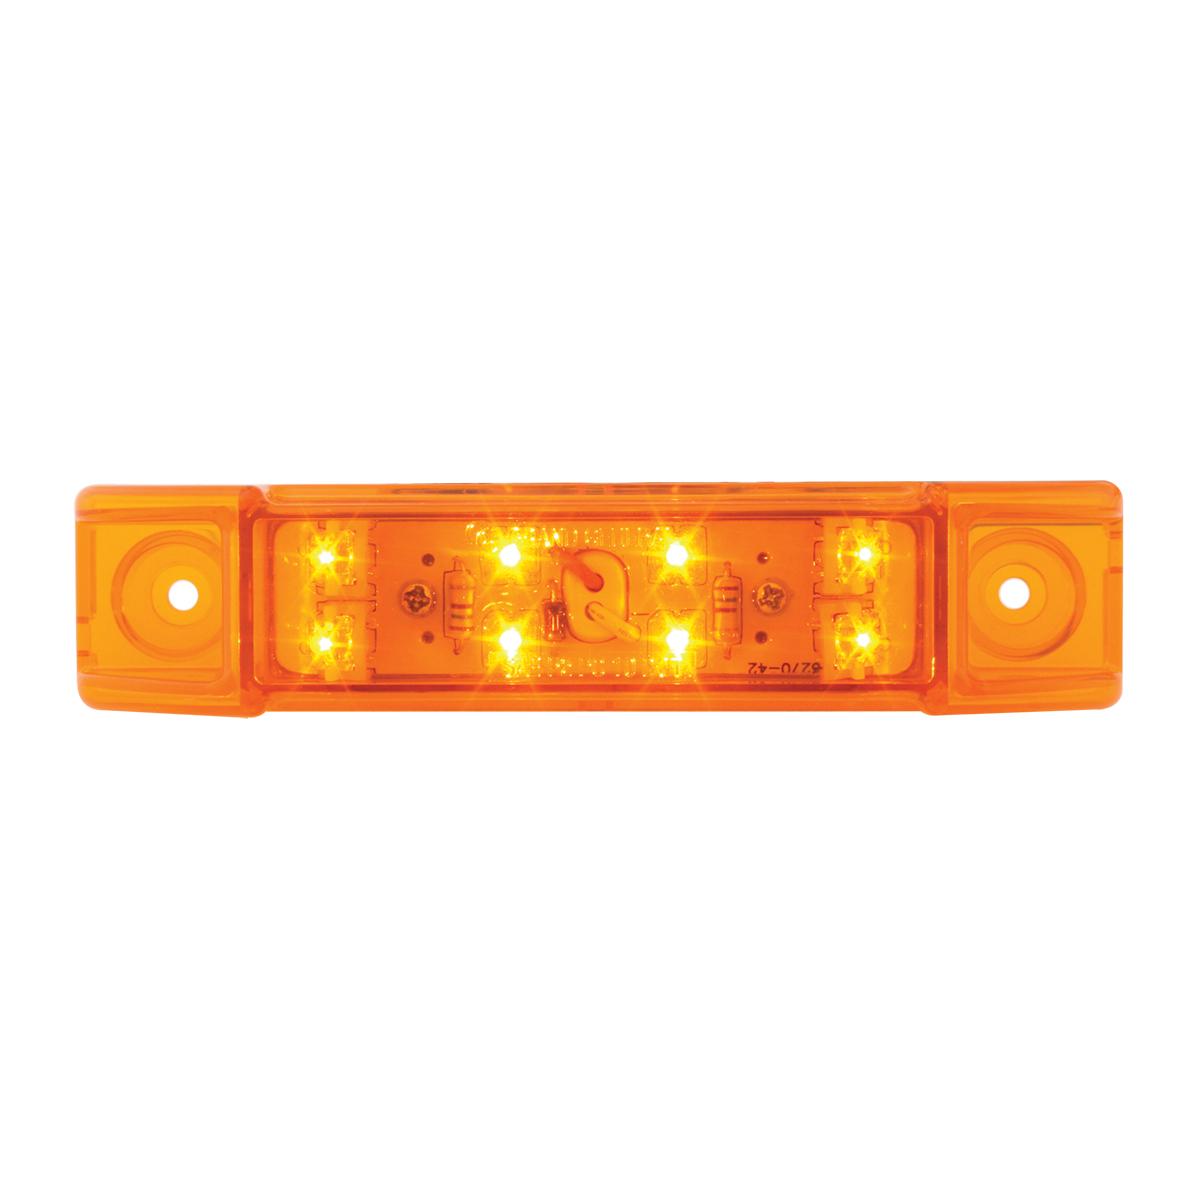 76260 Rectangular Wide Angle LED Light in Amber/Amber